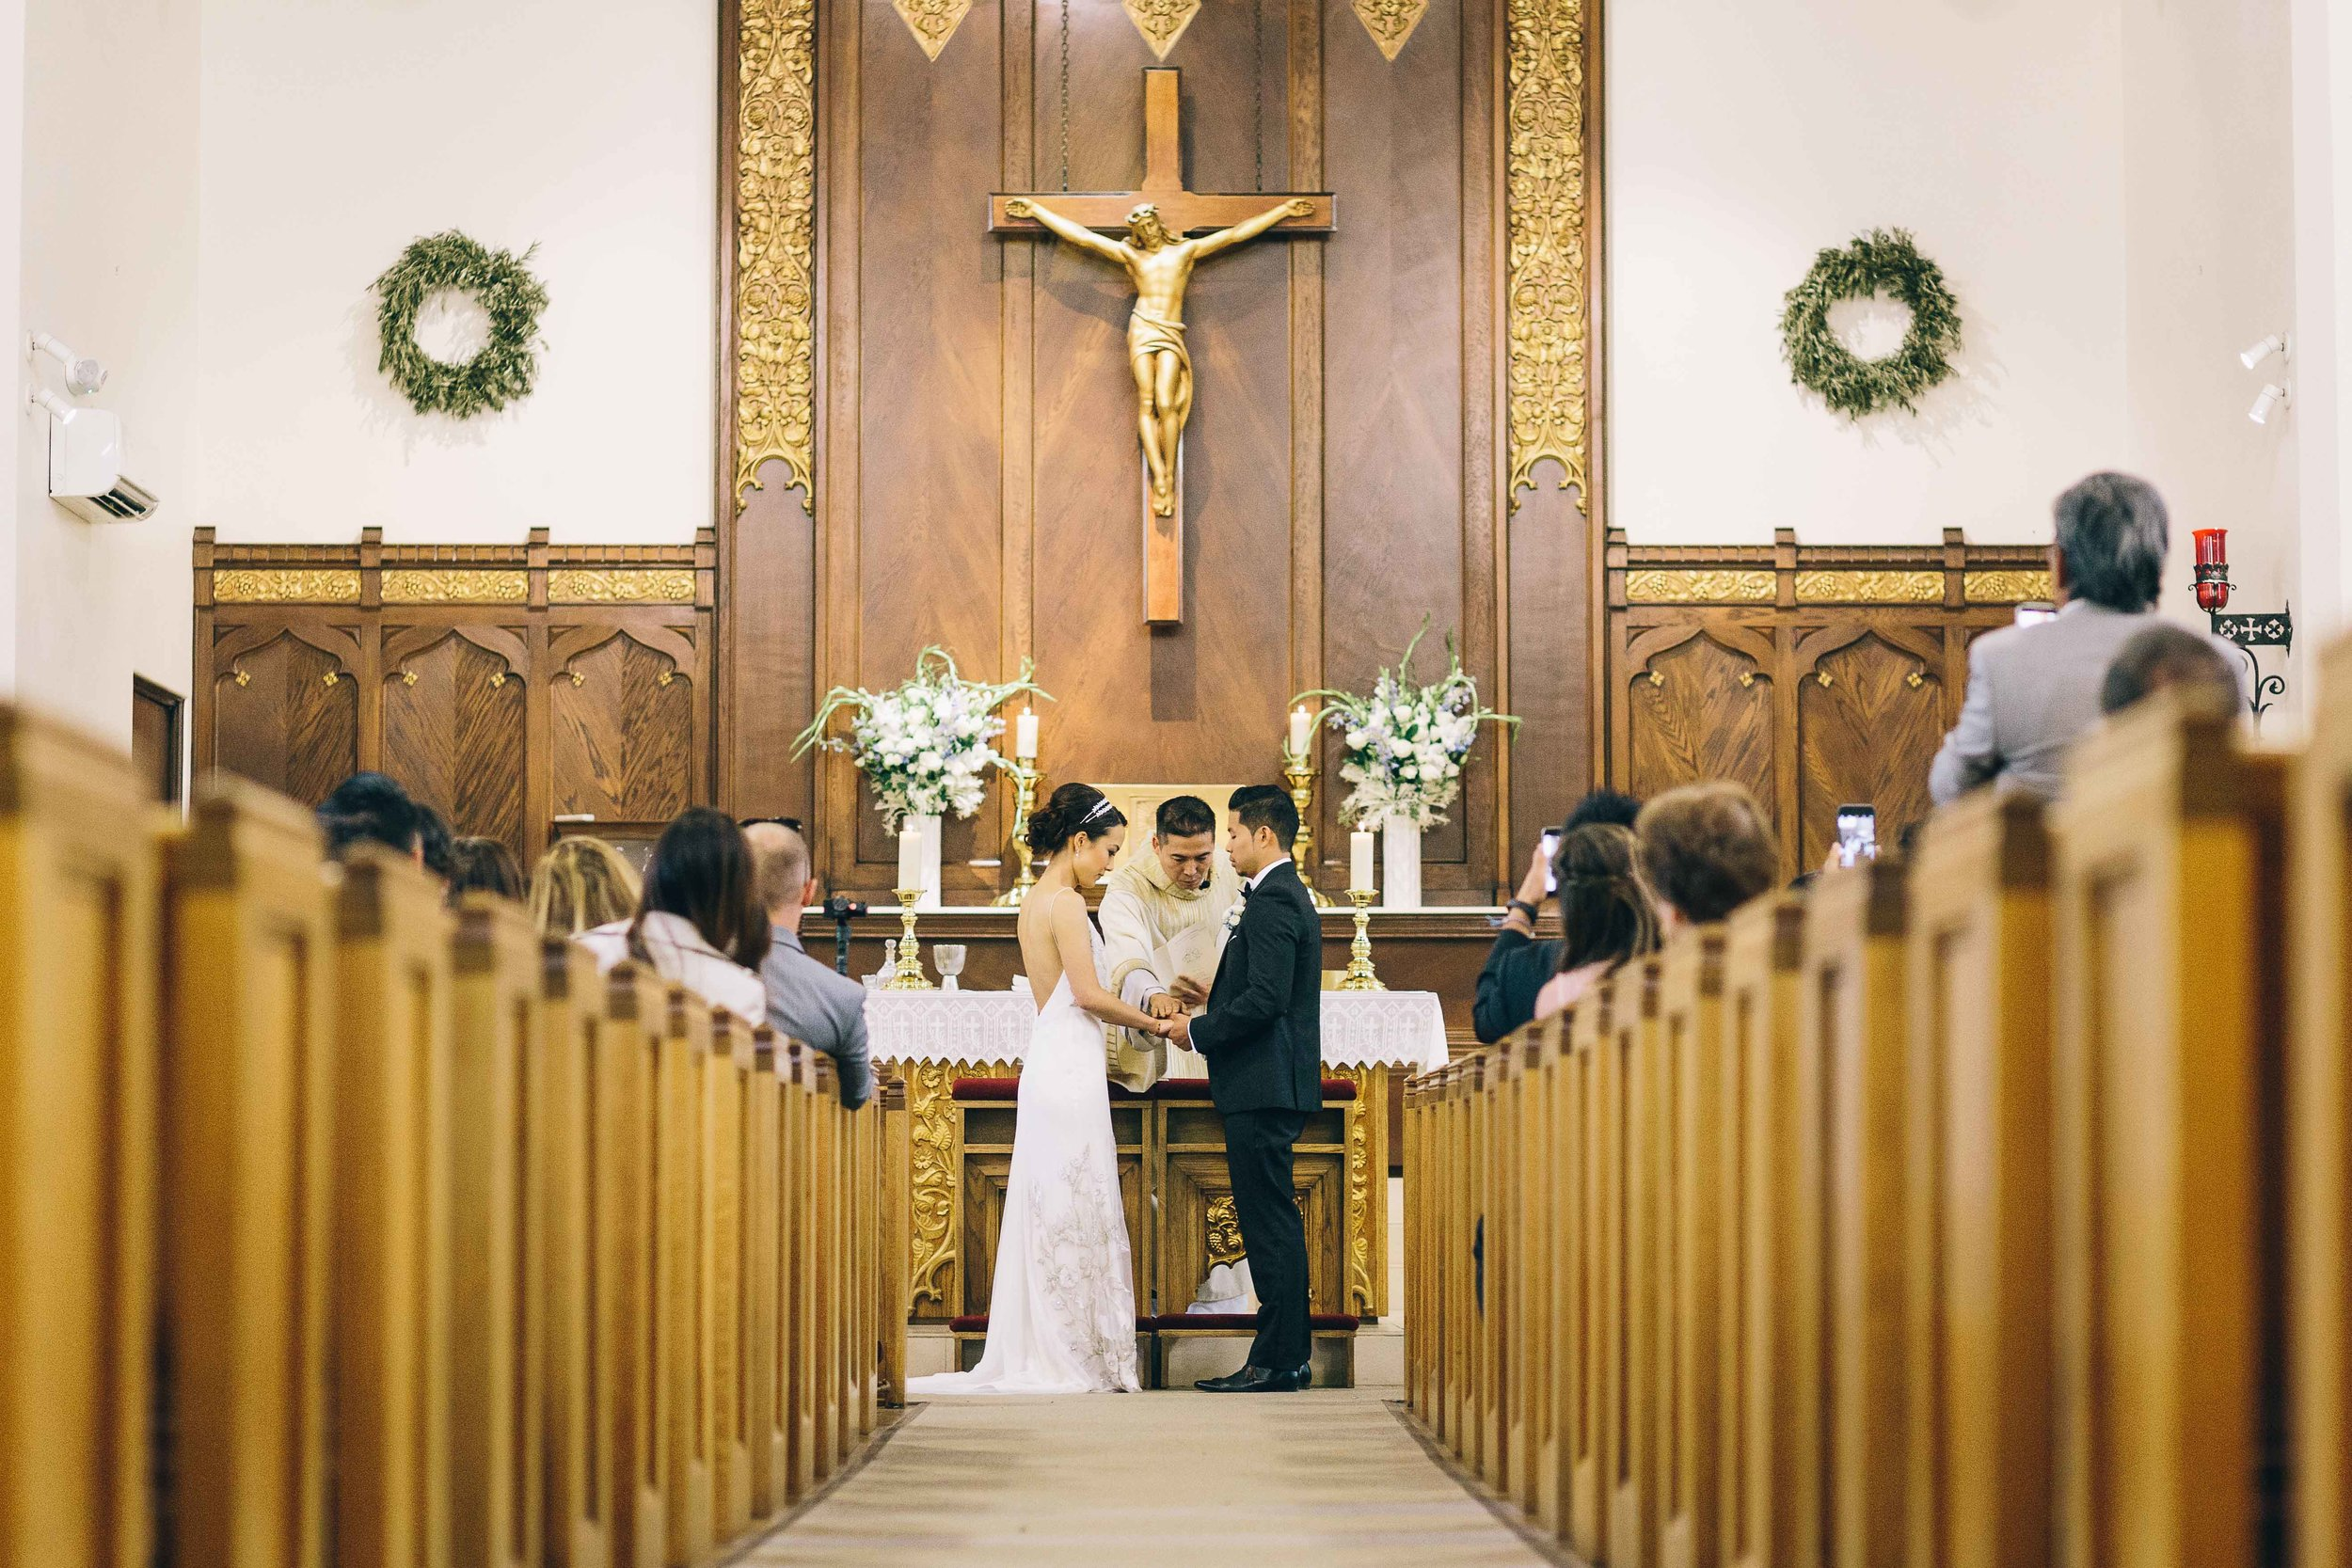 Westin Verasa Wedding at La Toque - JBJ Pictures Wedding Photographer in Napa Sonoma and San Francisco - 1 (10).jpg